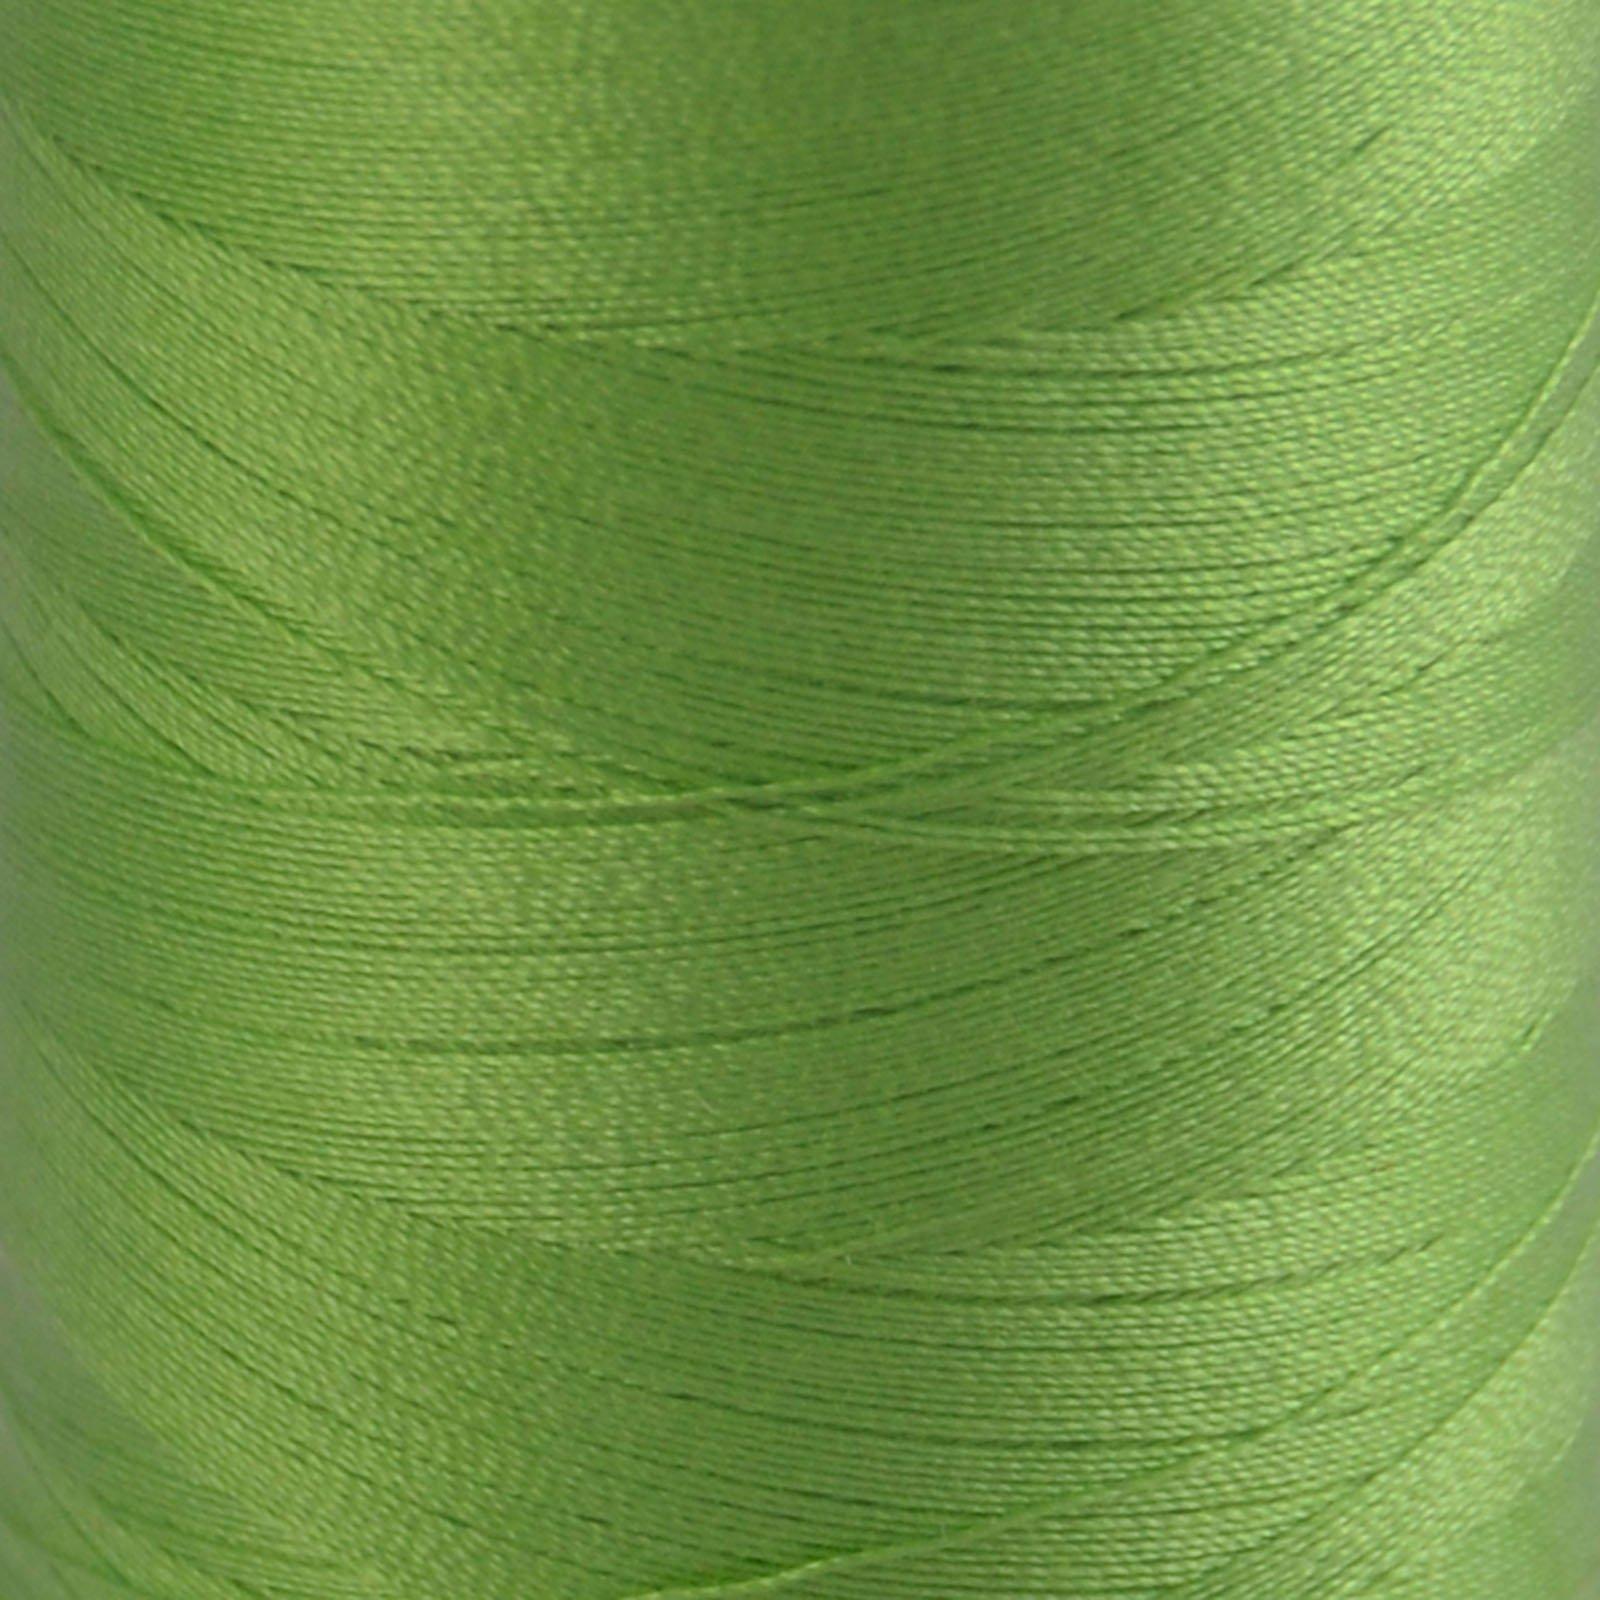 # 5017 Shining Green